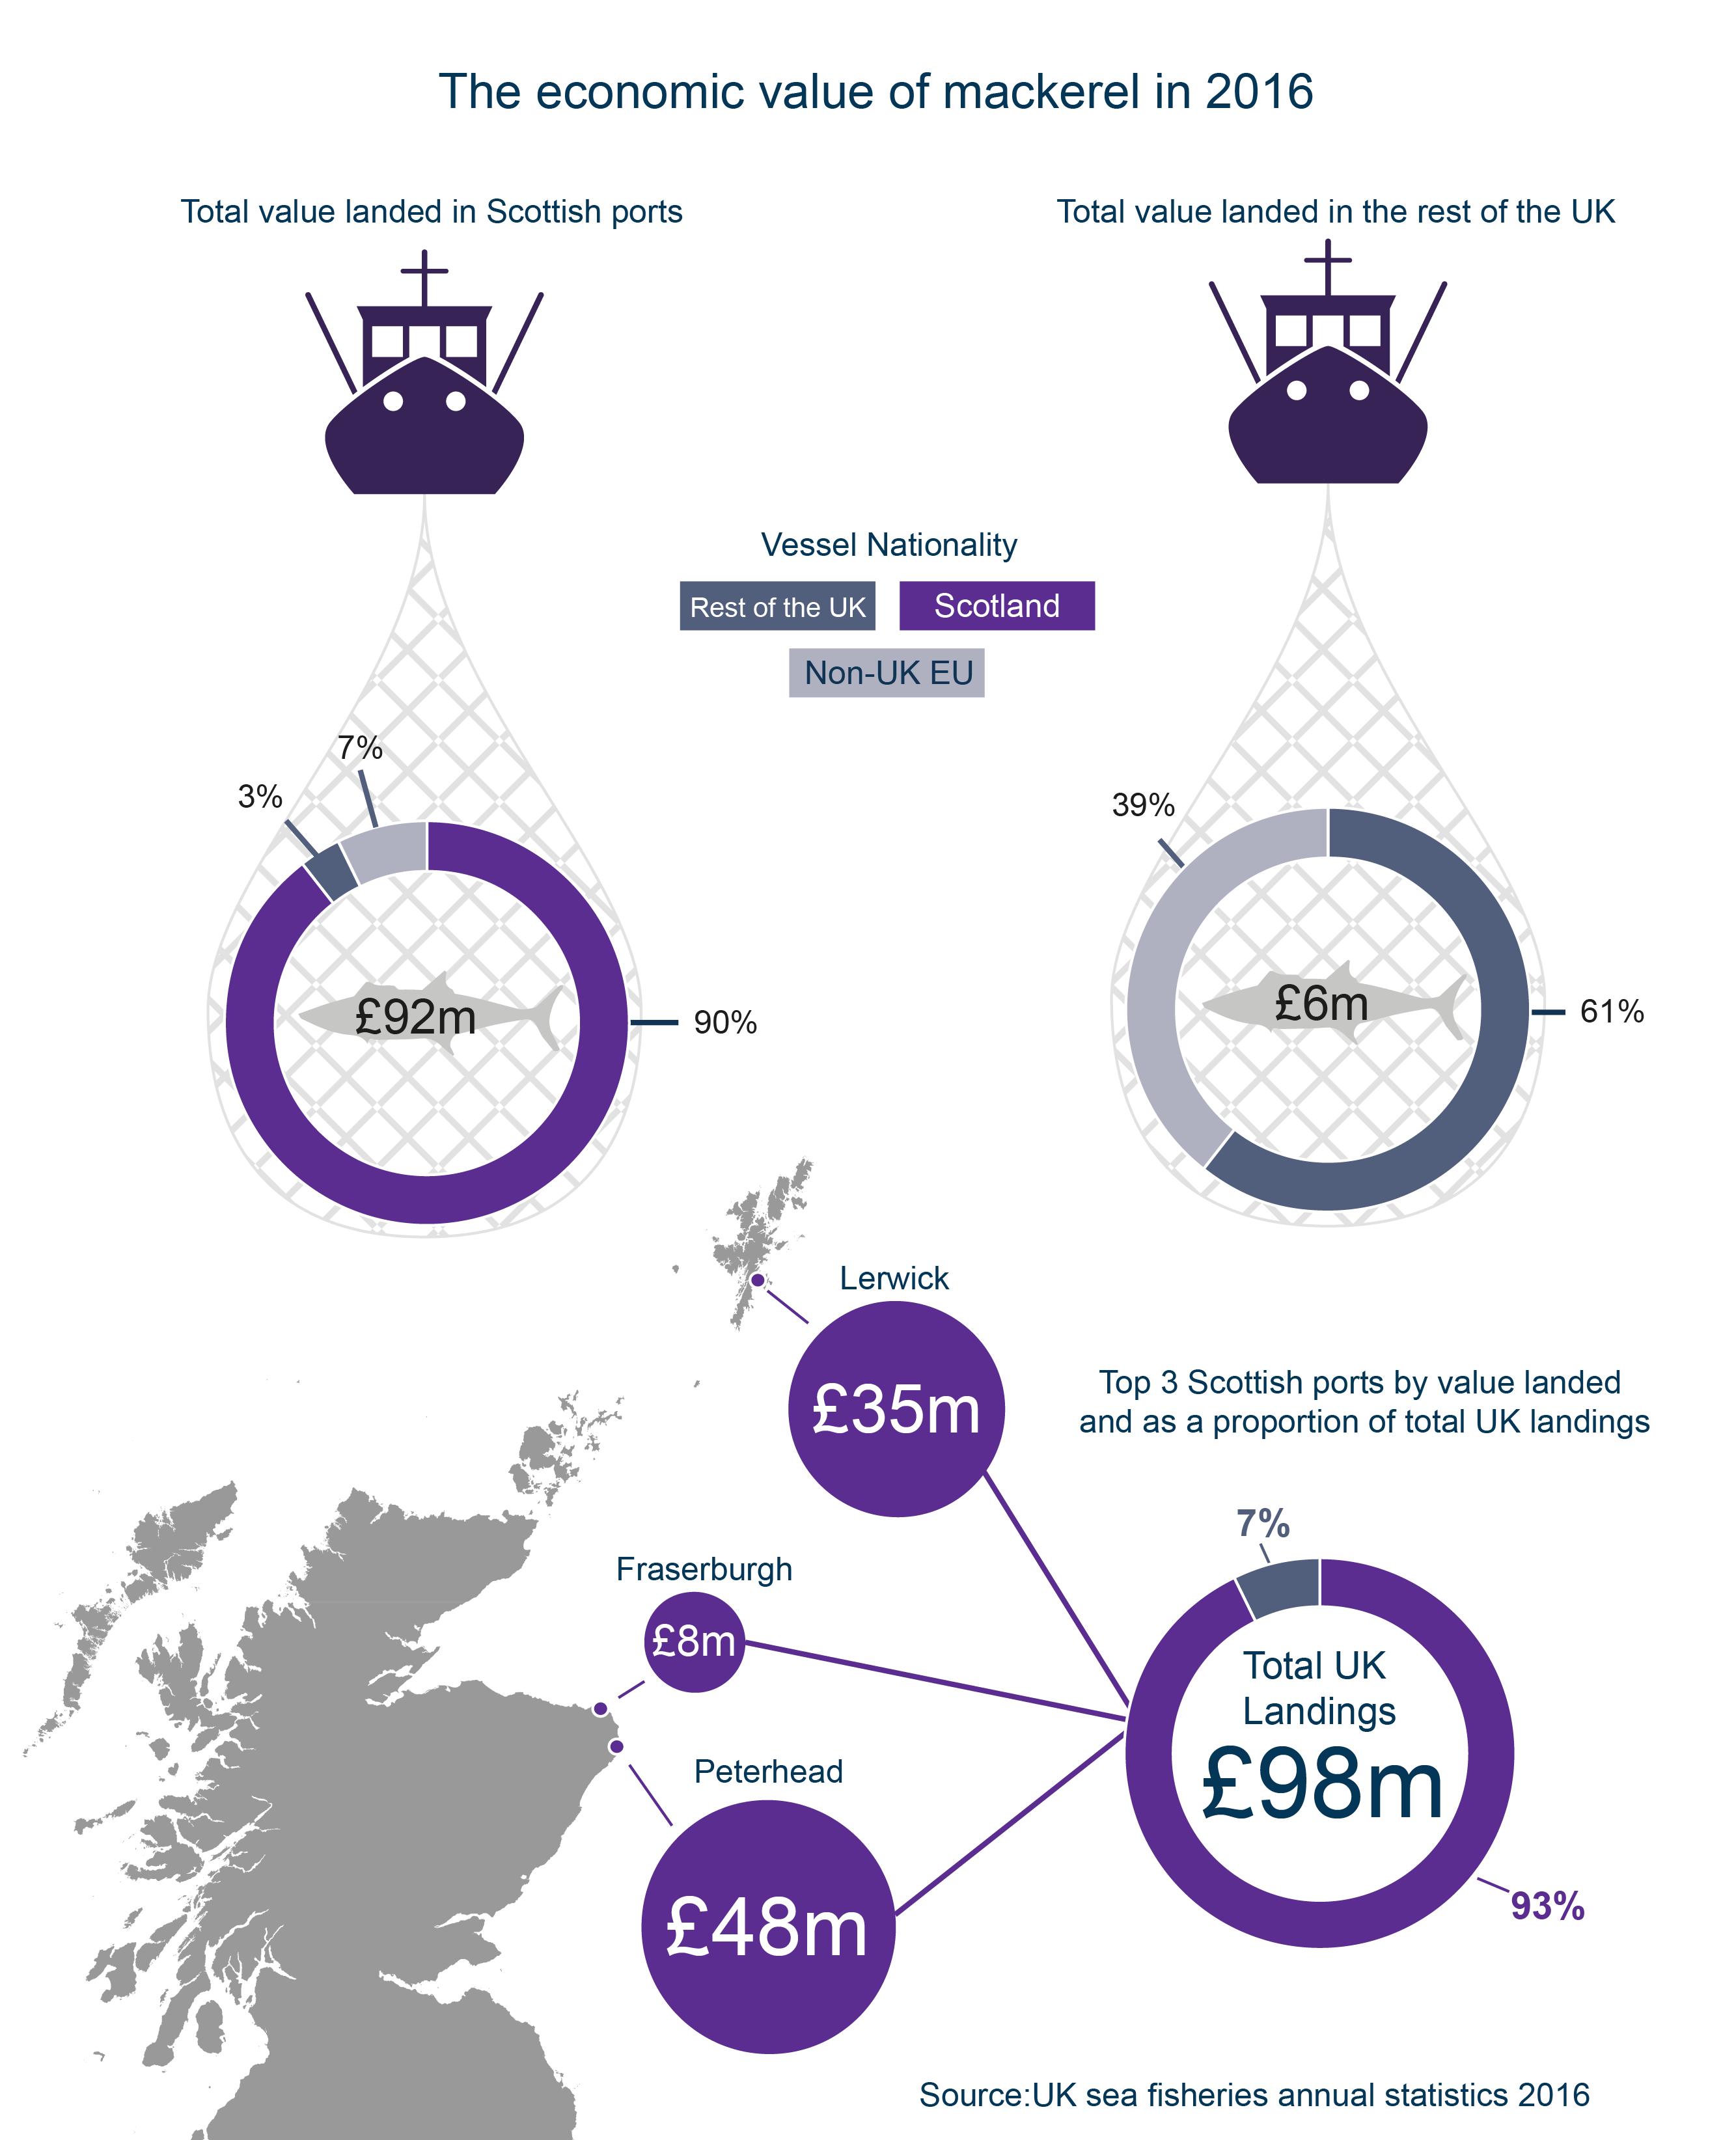 The economic value of mackerel to Scotland